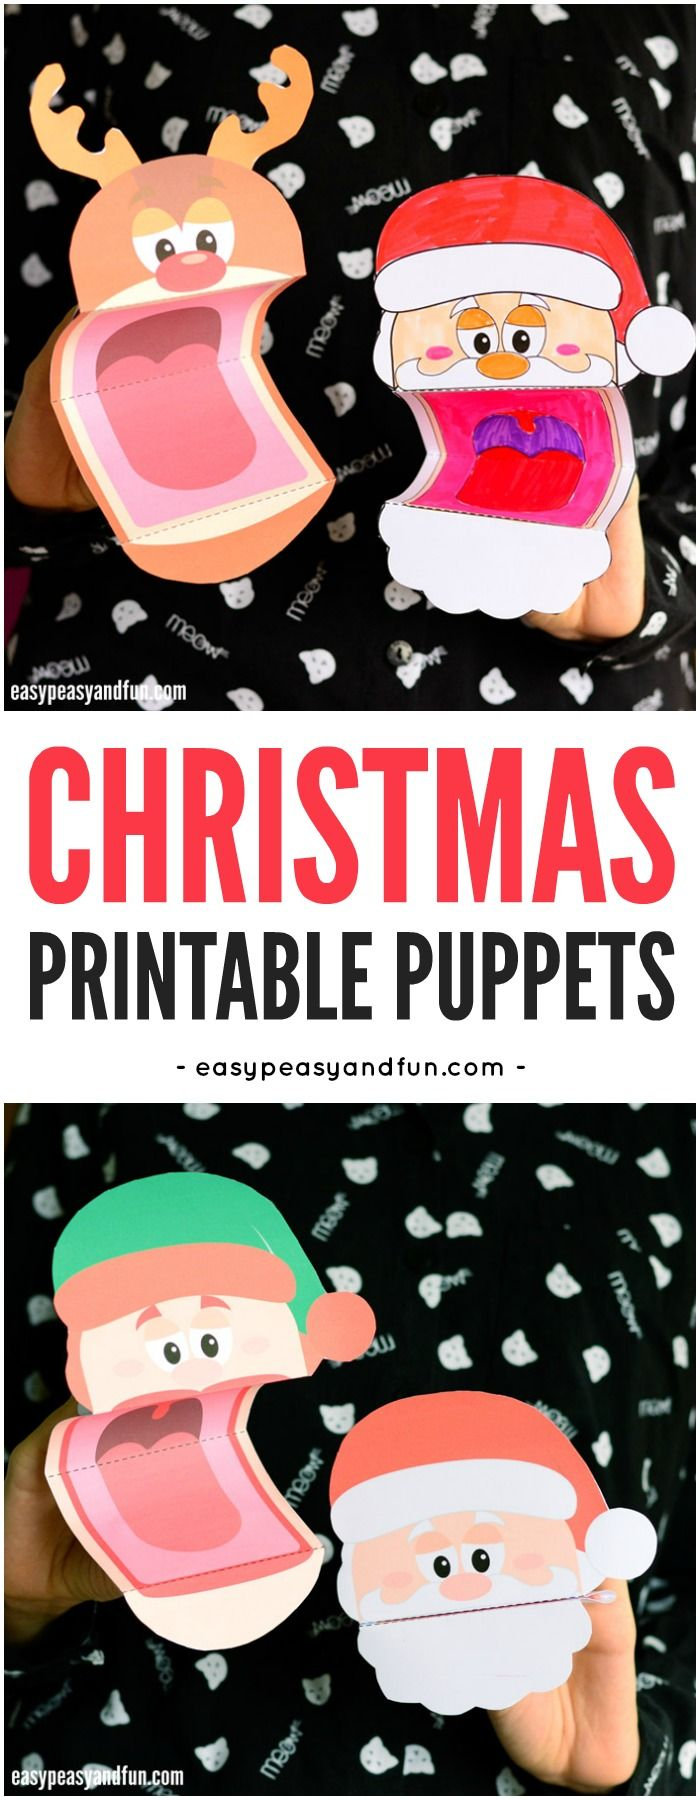 Printable Christmas Puppets for Kids. A fun Christmas craft for kids to make and play with. #Christmascraftsforkids #Papercraftsforkids #printablepuppets